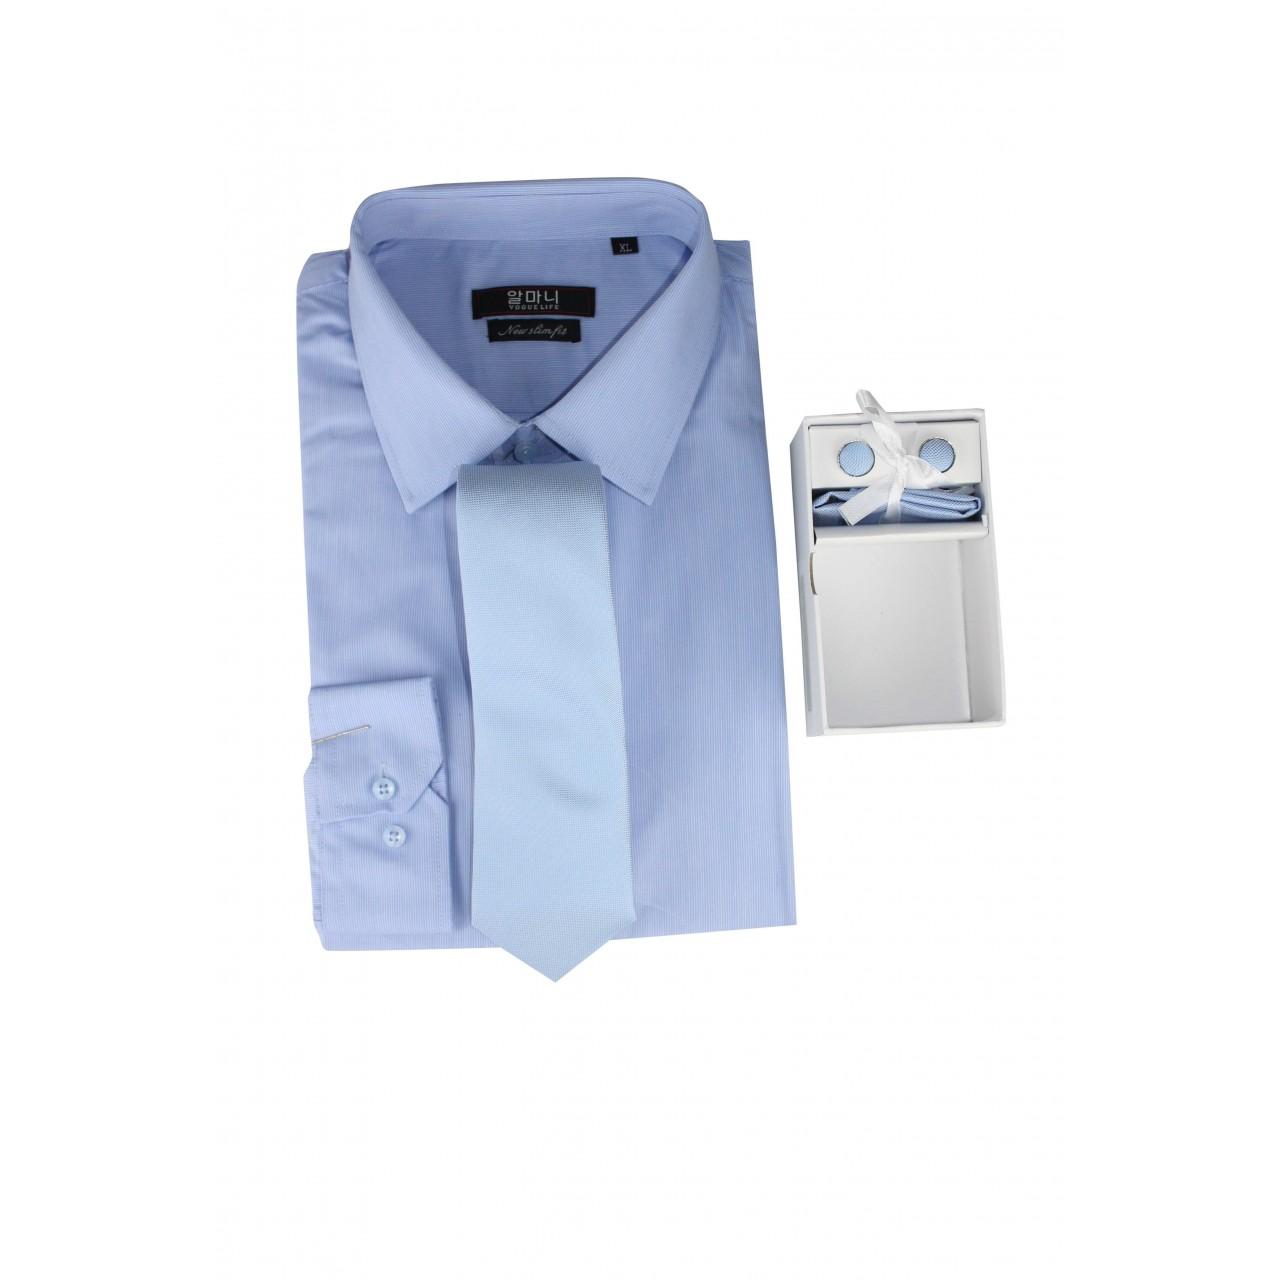 VOGUE LIFE Basic Formal Shirt With Set